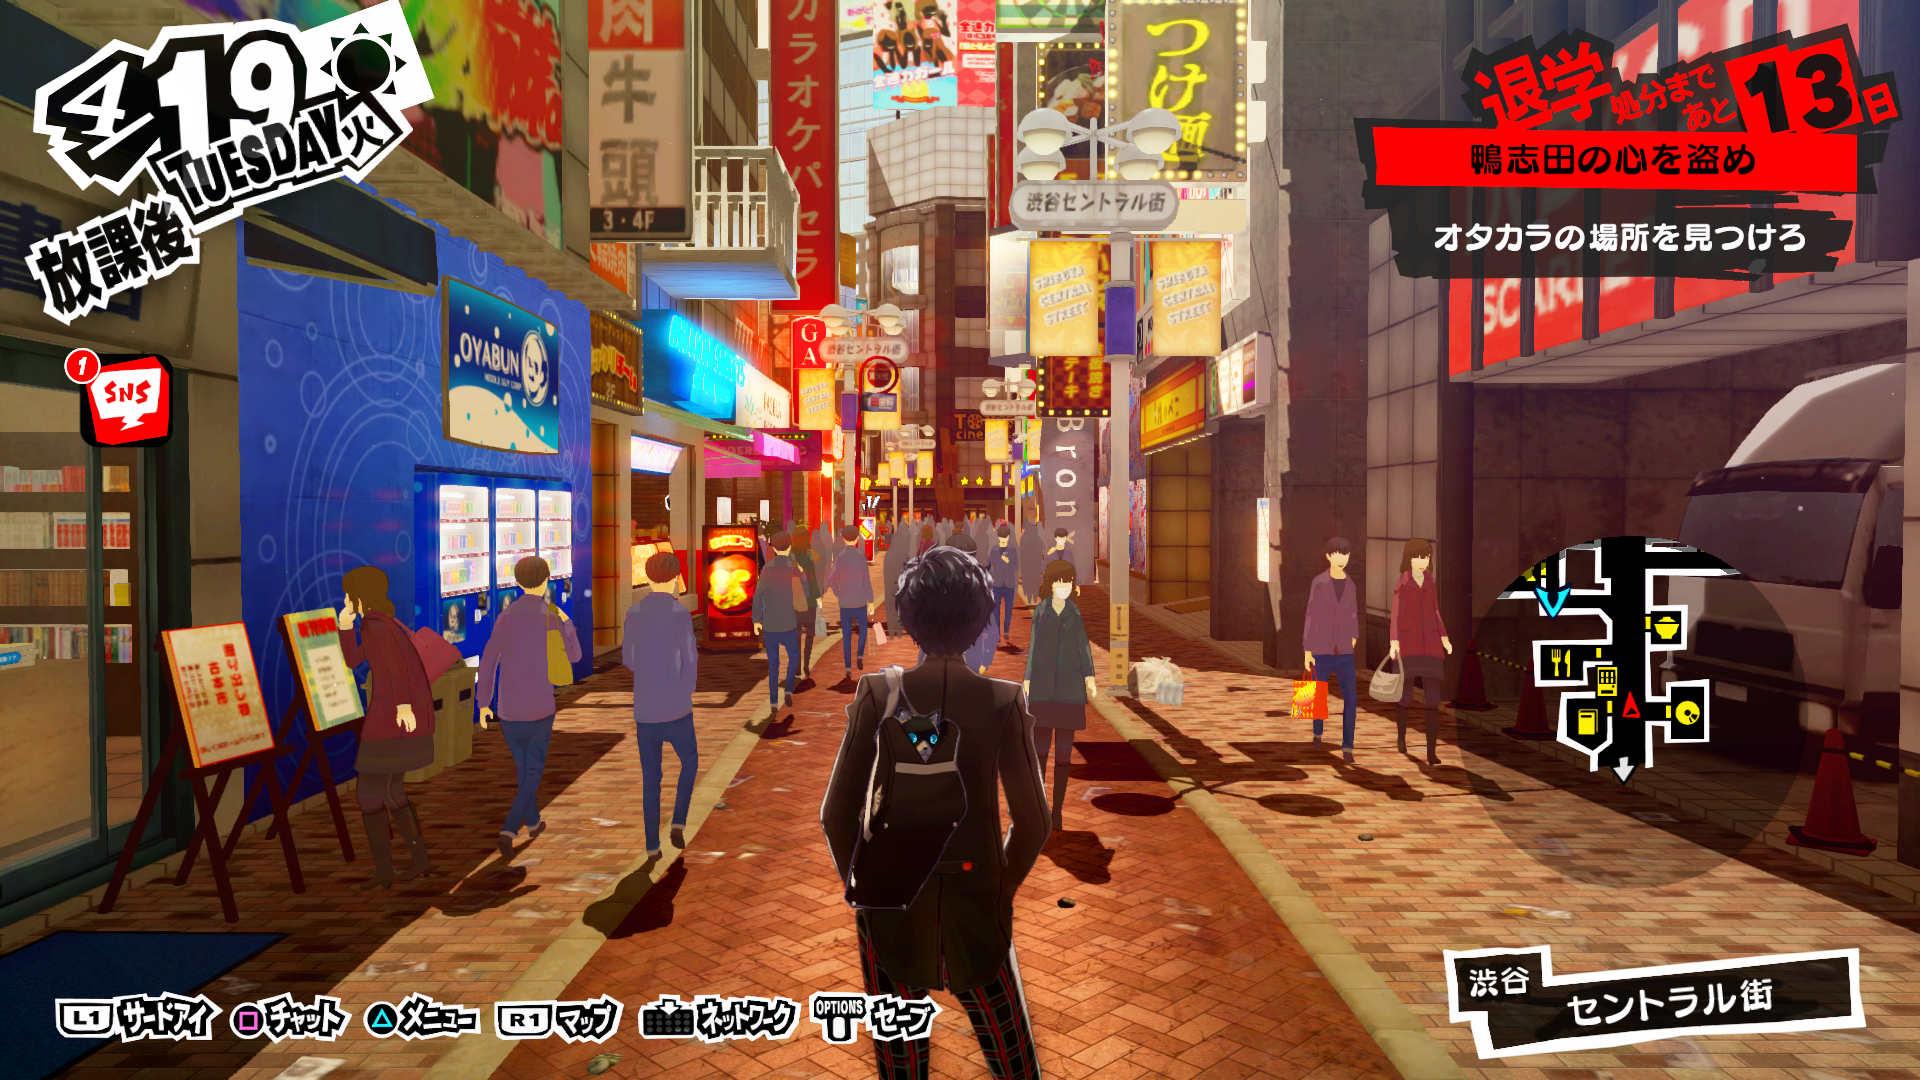 Persona 5 recrée des quartiers bien réels de Tokyo. Ici, Shibuya.